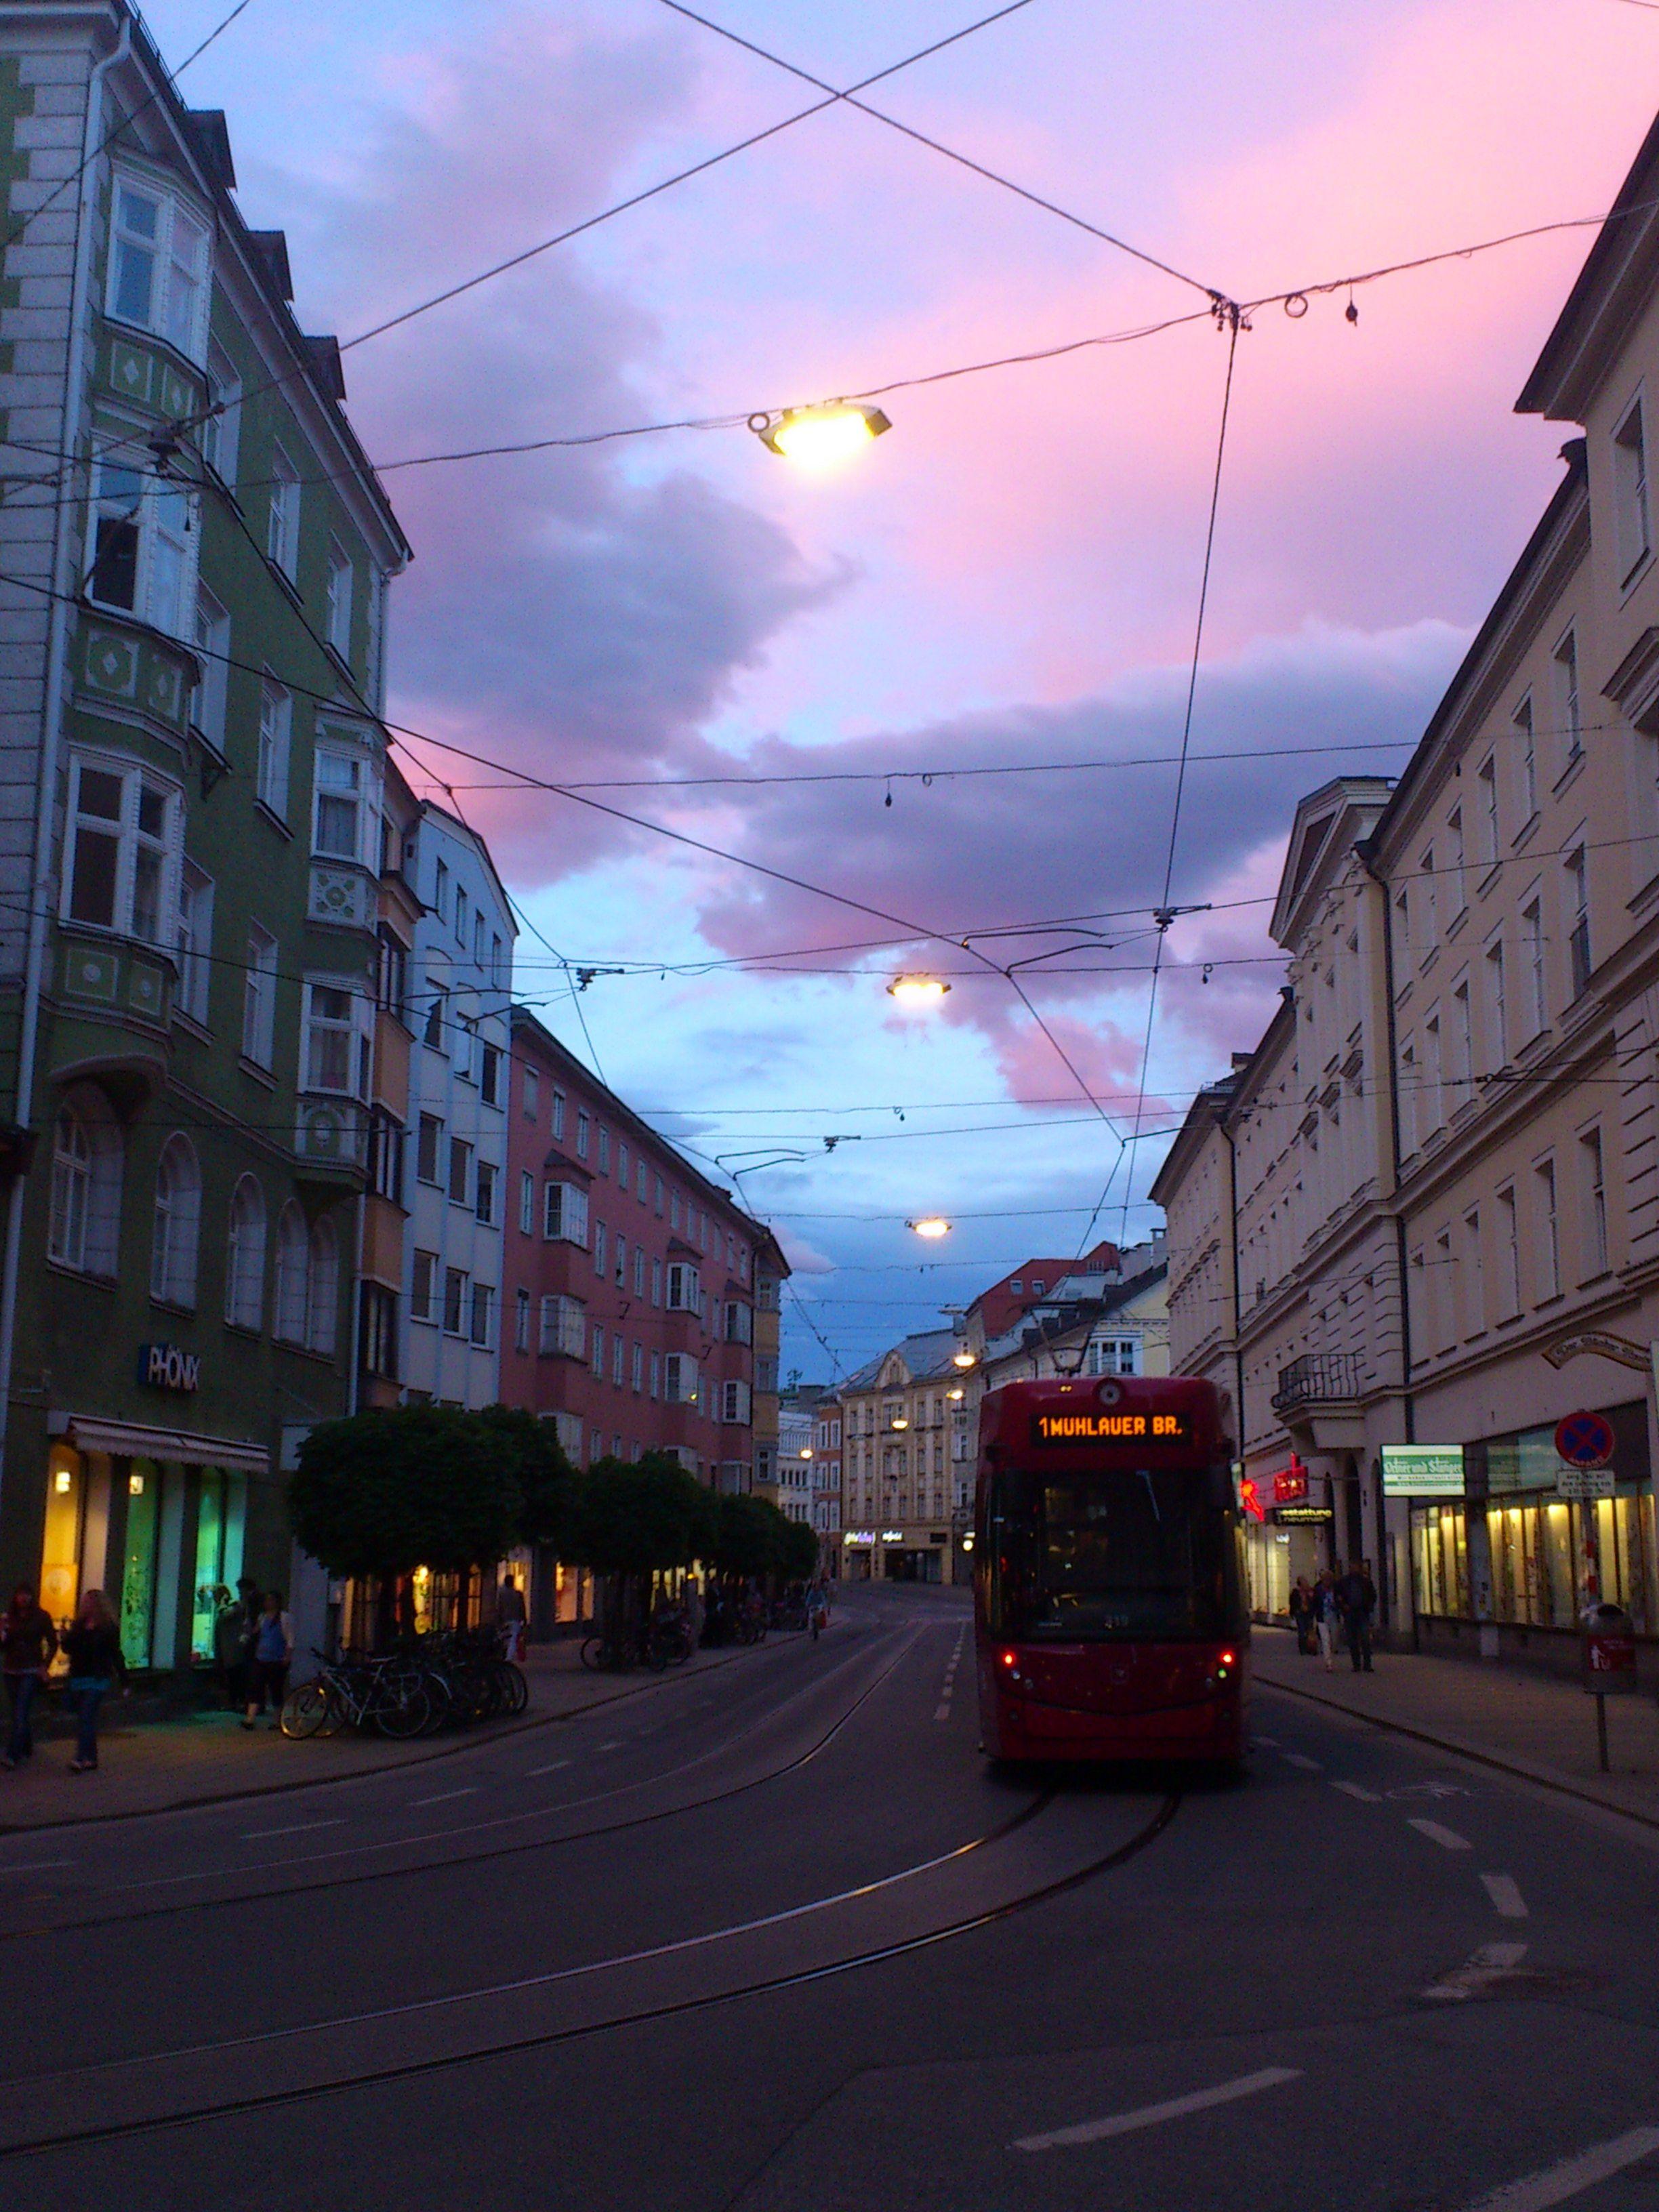 evening atmosphere in #Innsbruck - Austria